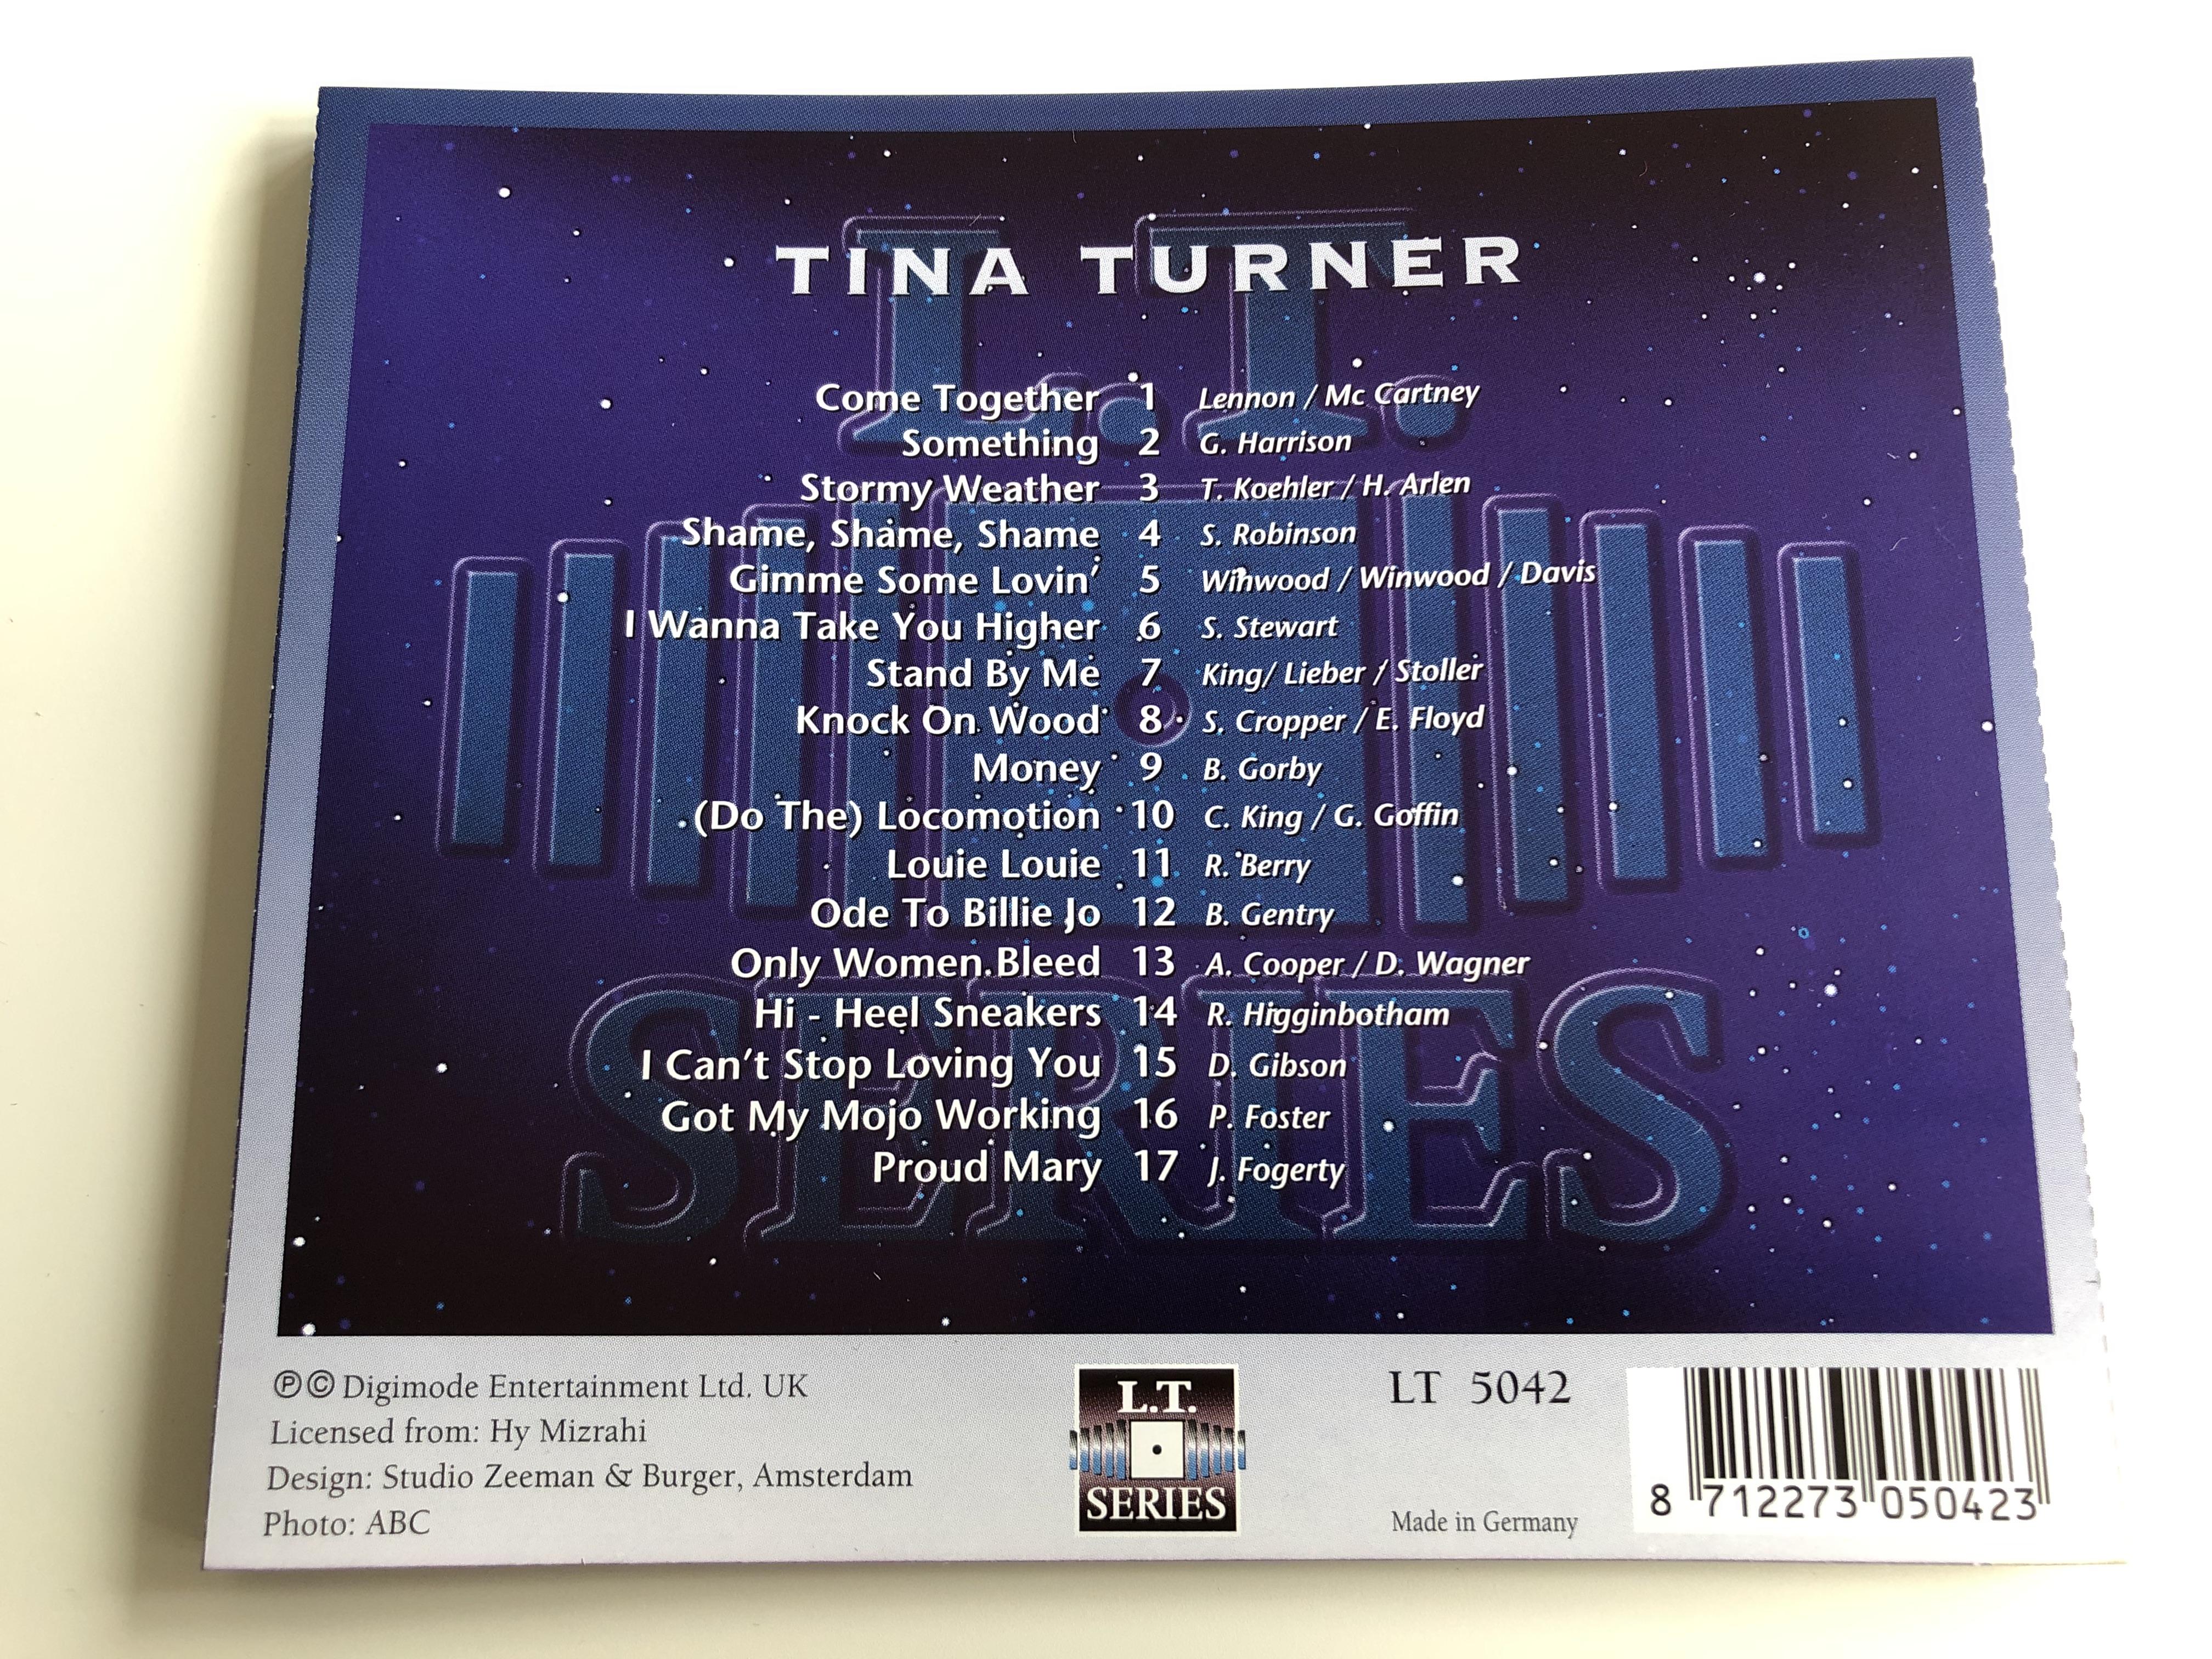 tina-turner-img-3959.jpg